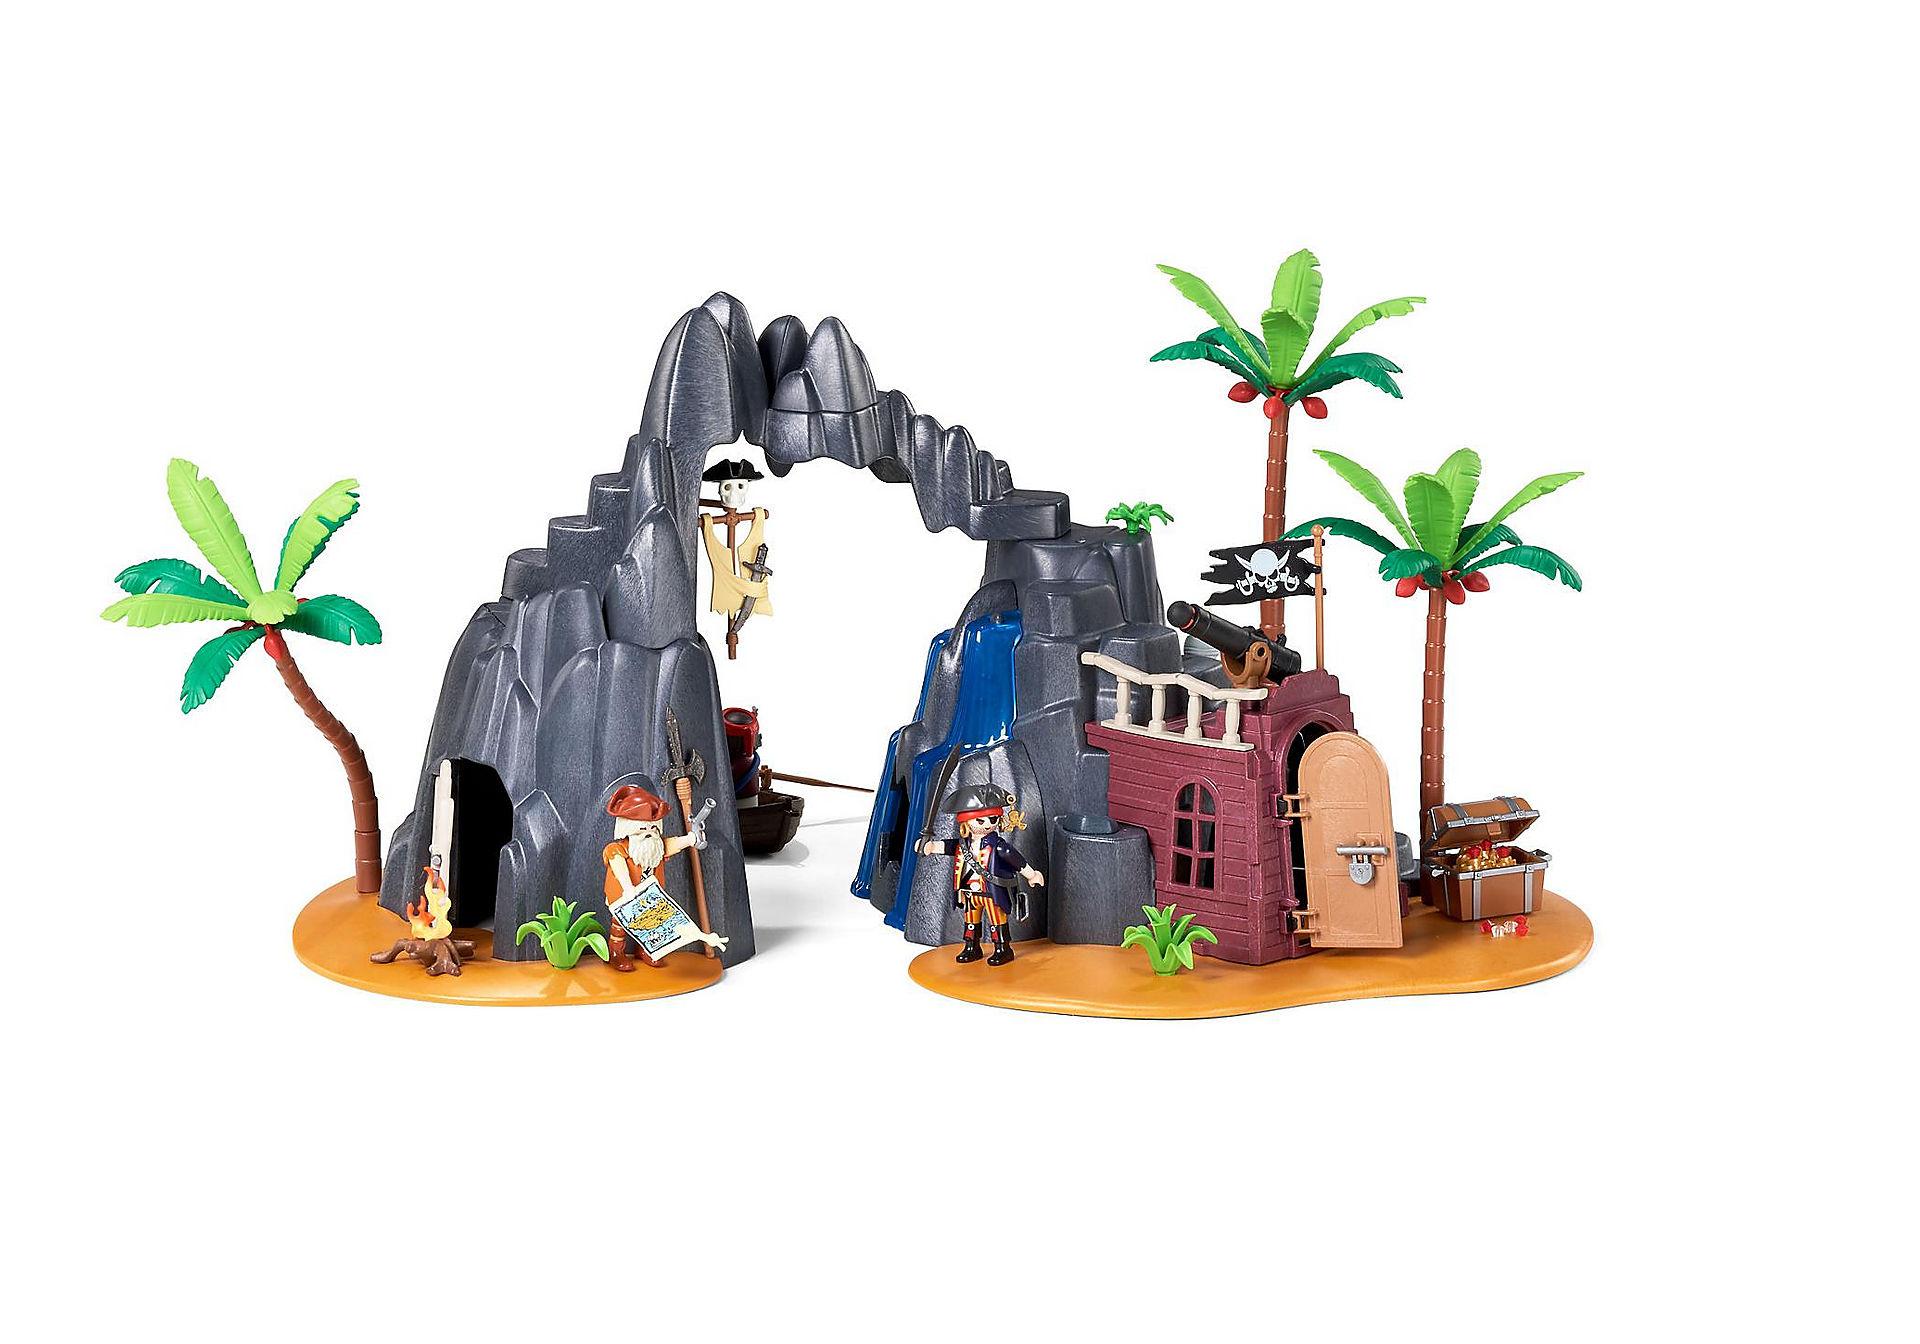 PLAYMOBIL PIRATES Piraten-Schatzinsel 6679 im Playmobil Shop